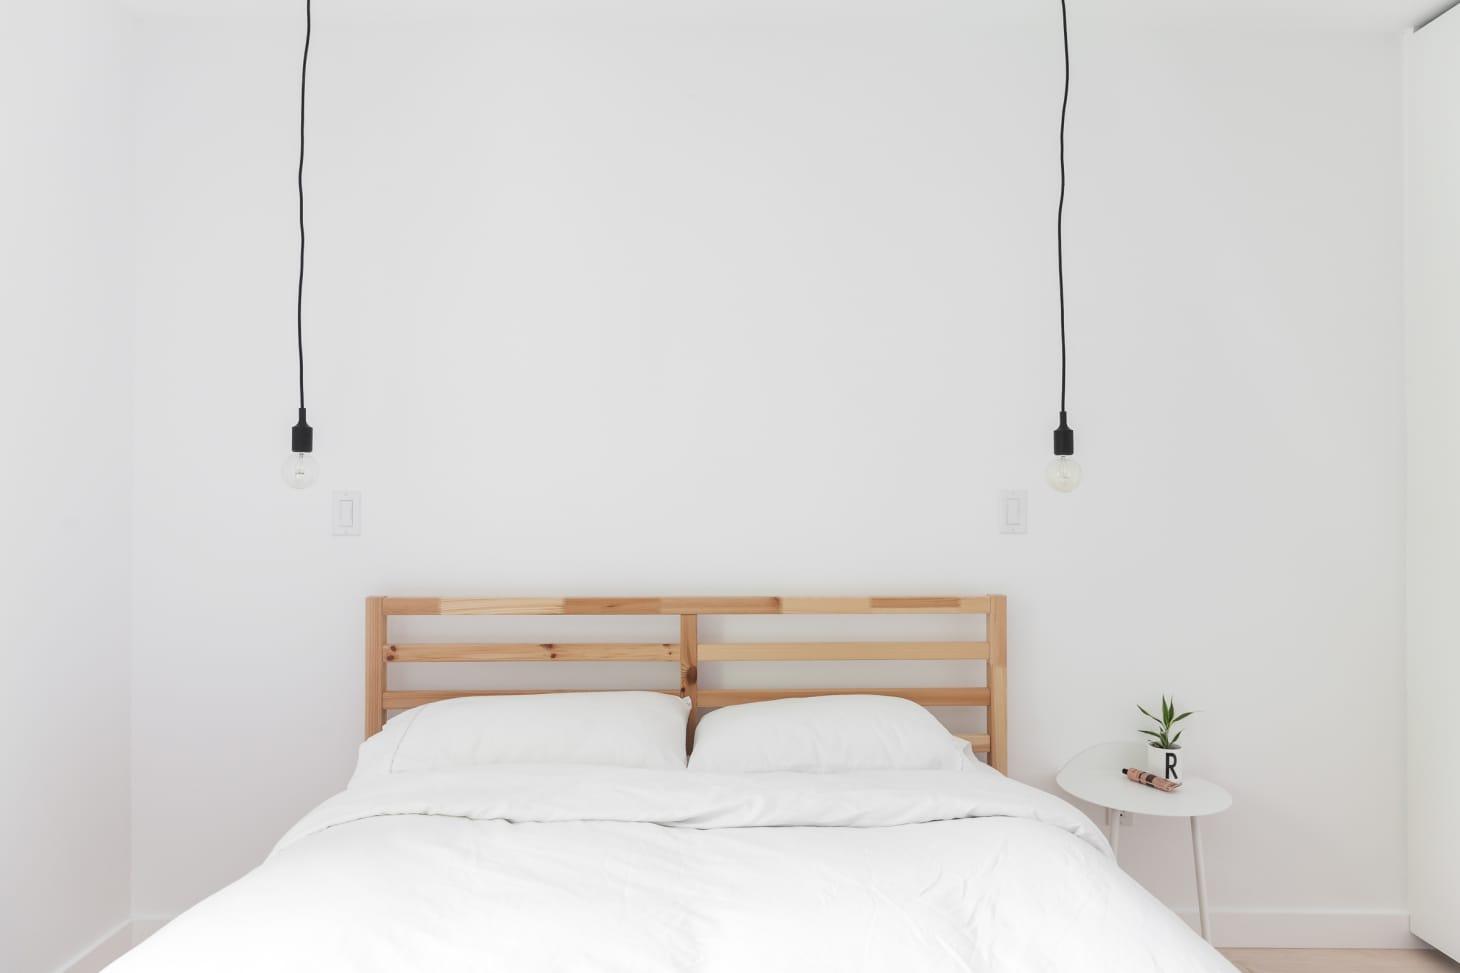 new styles e9cd1 0ba98 Minimalist Bedroom Ideas (That Aren't Boring) | Apartment ...